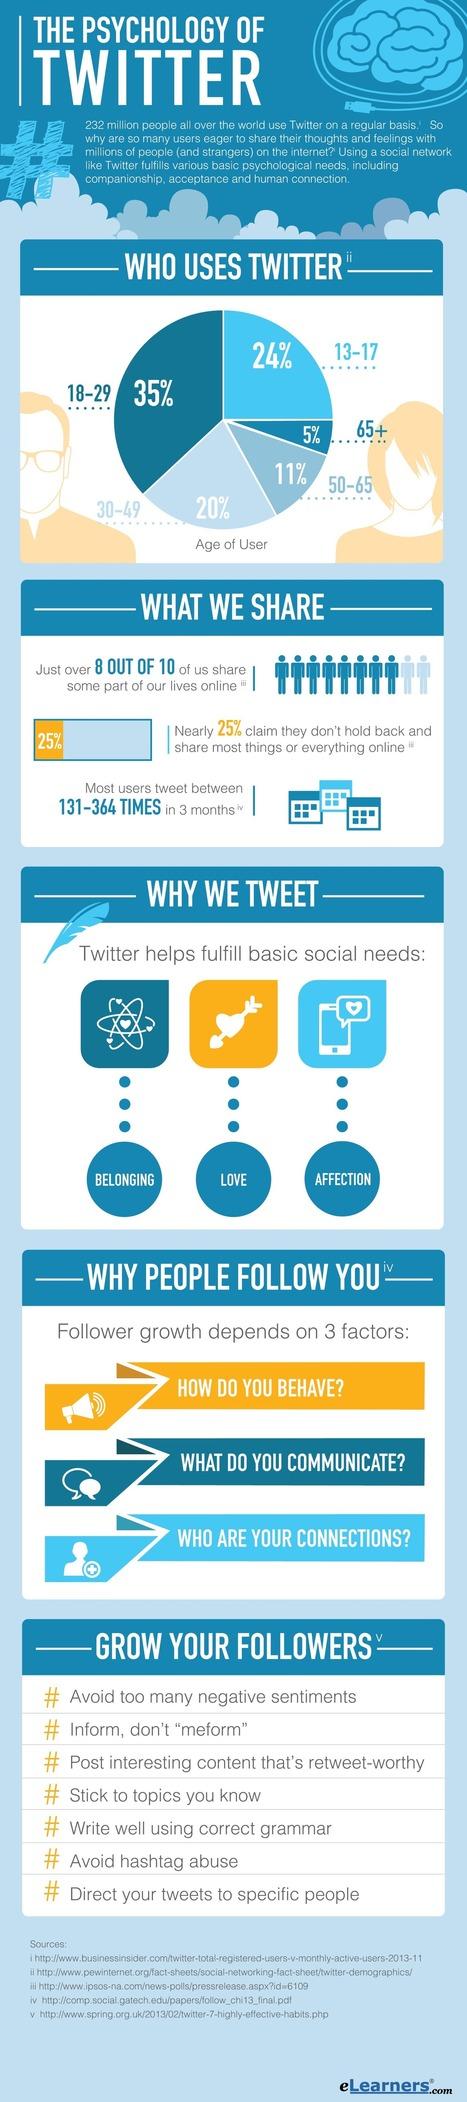 The Psychology of Twitter   Internet Psychology   Scoop.it